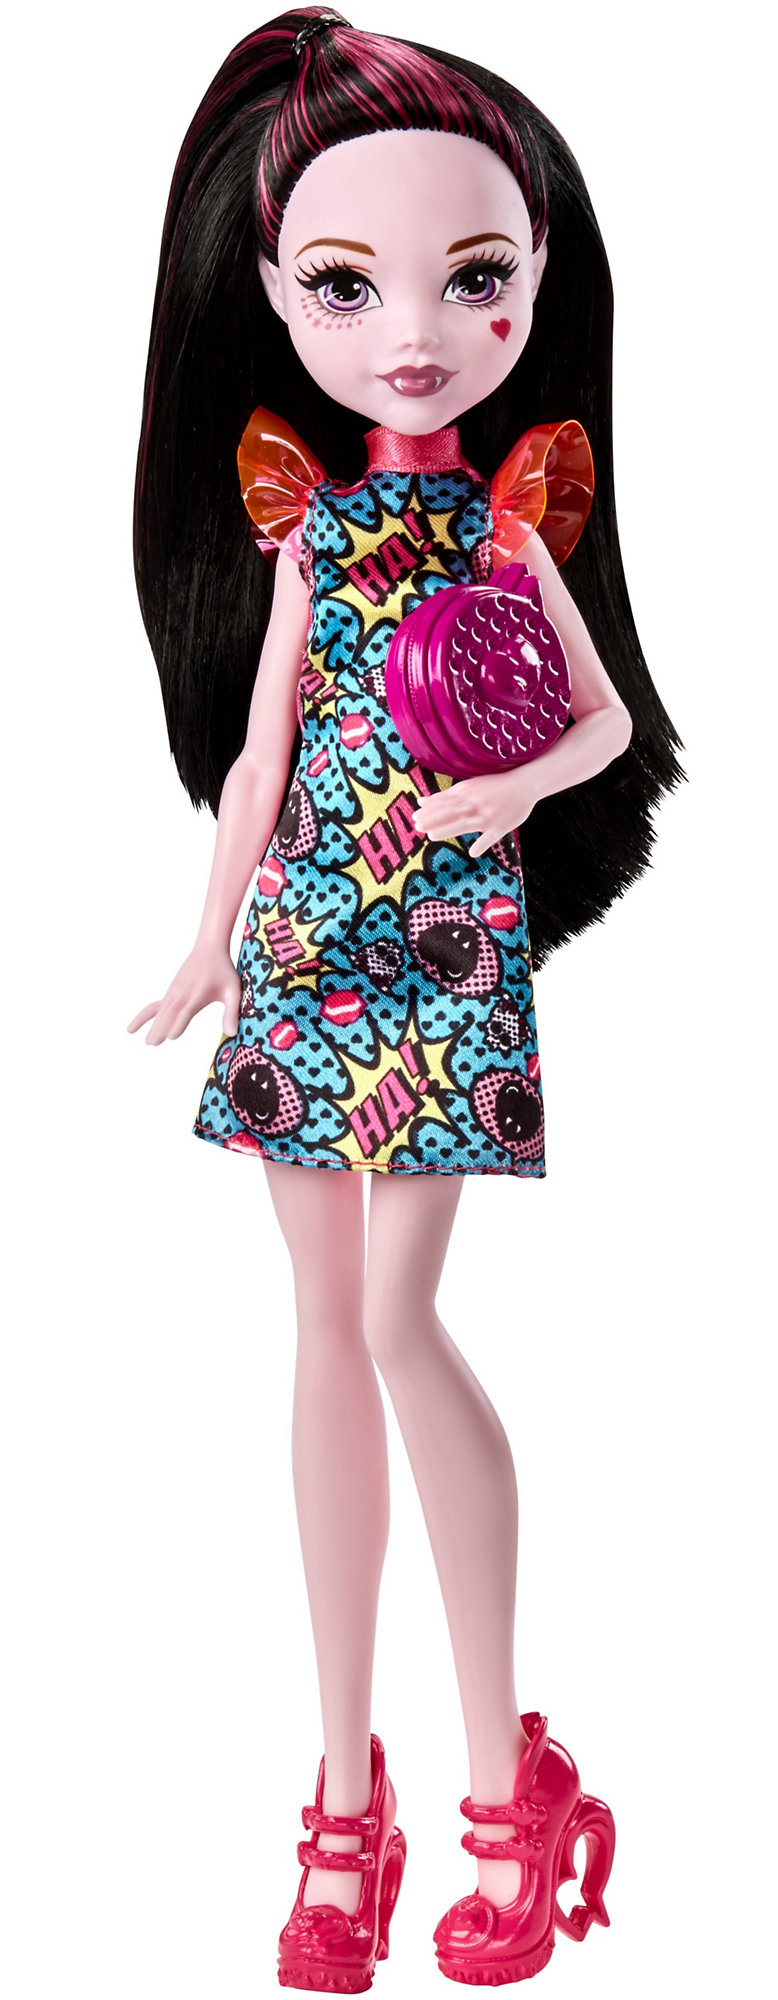 Monster High Draculaura Doll by Mattel